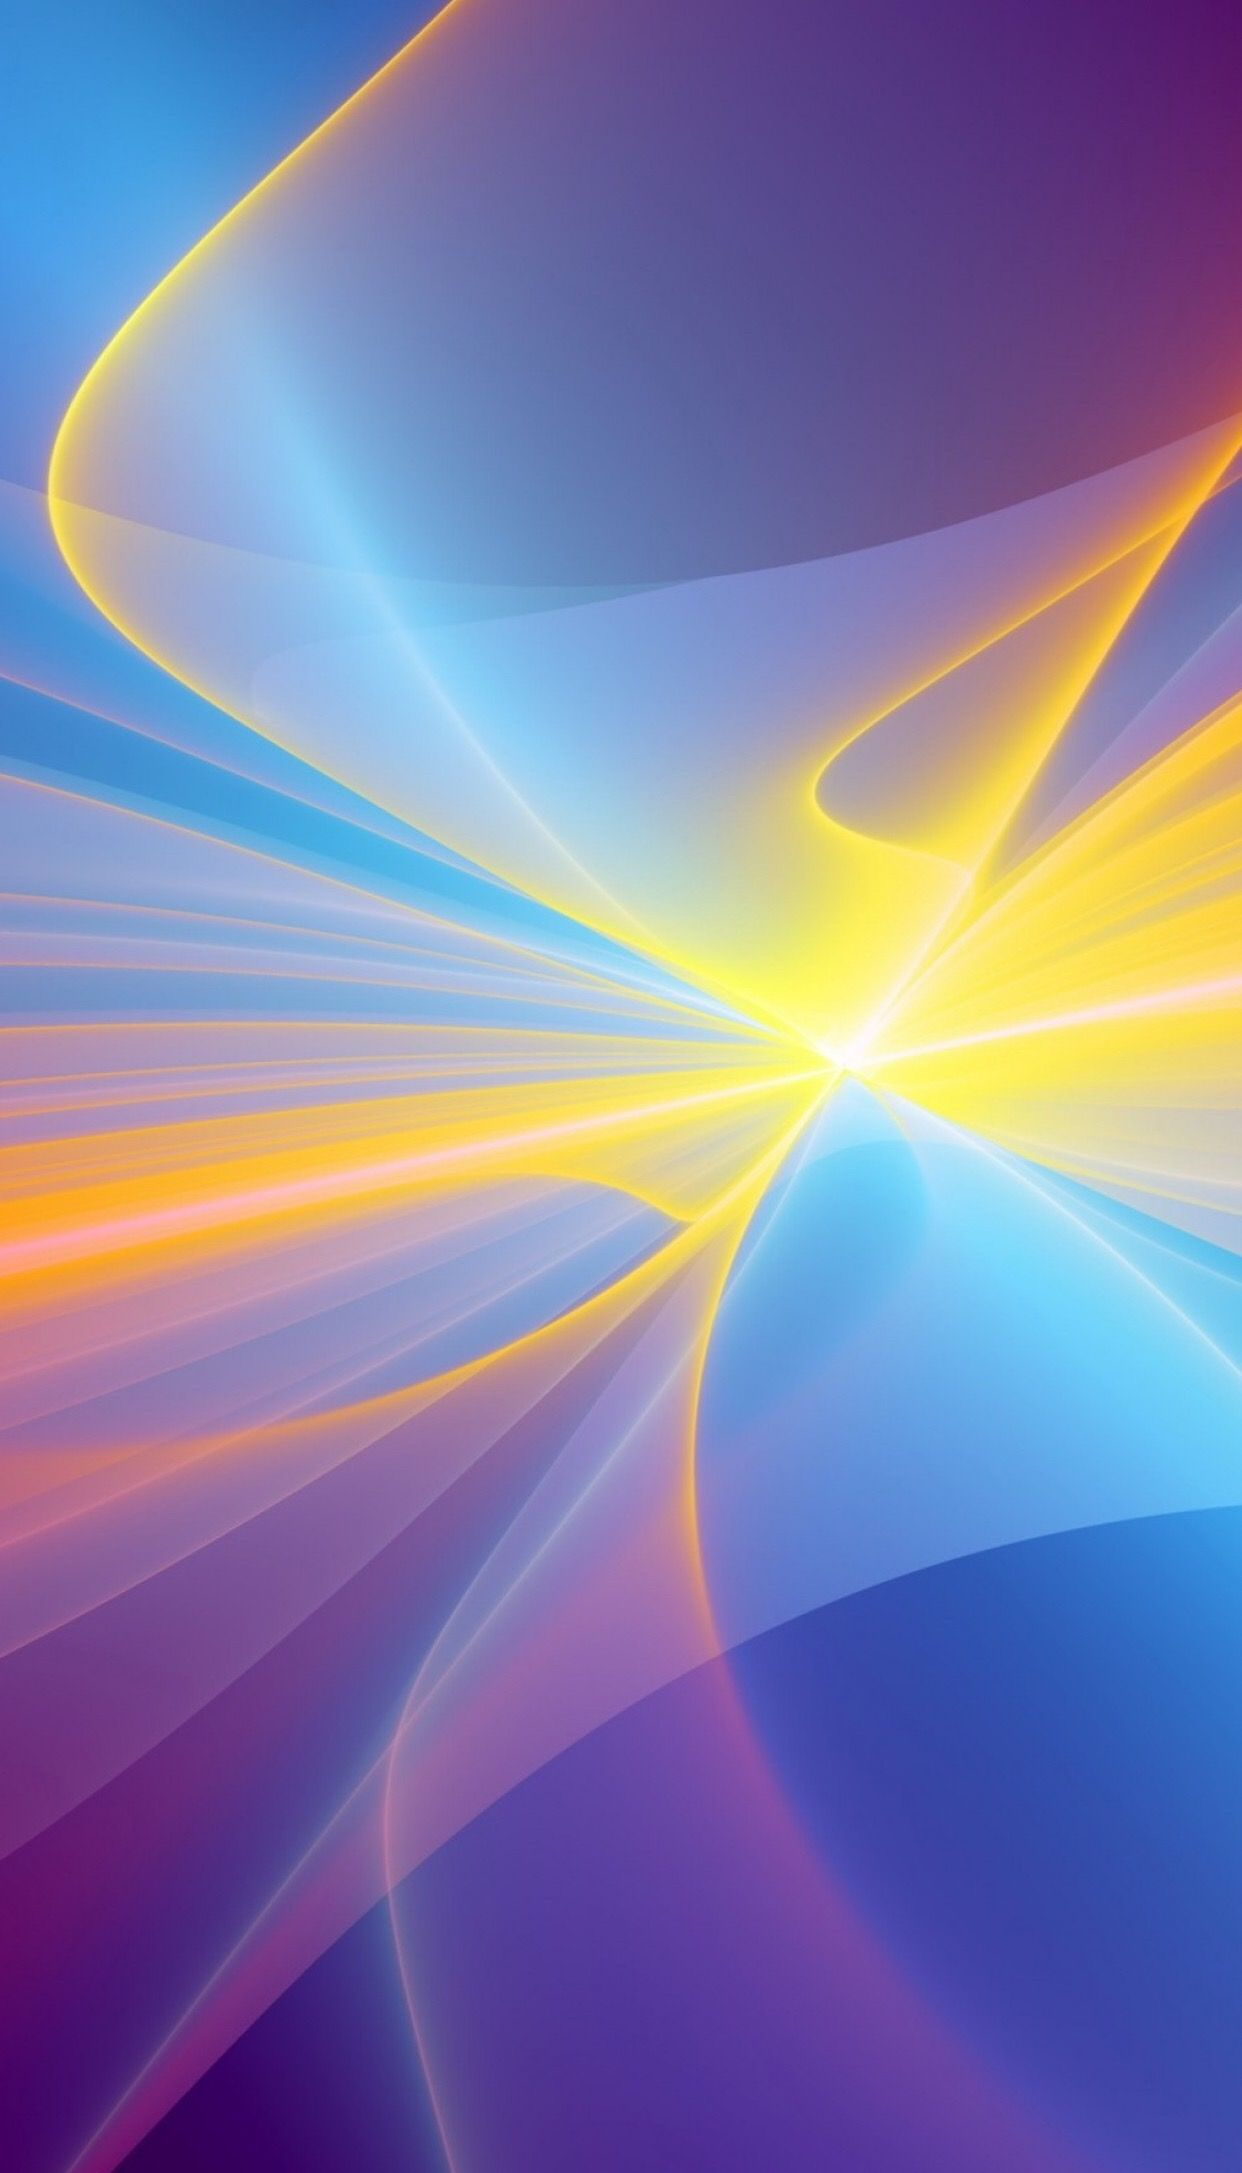 iOS 11, yellow, digital, blue, abstract, apple, wallpaper